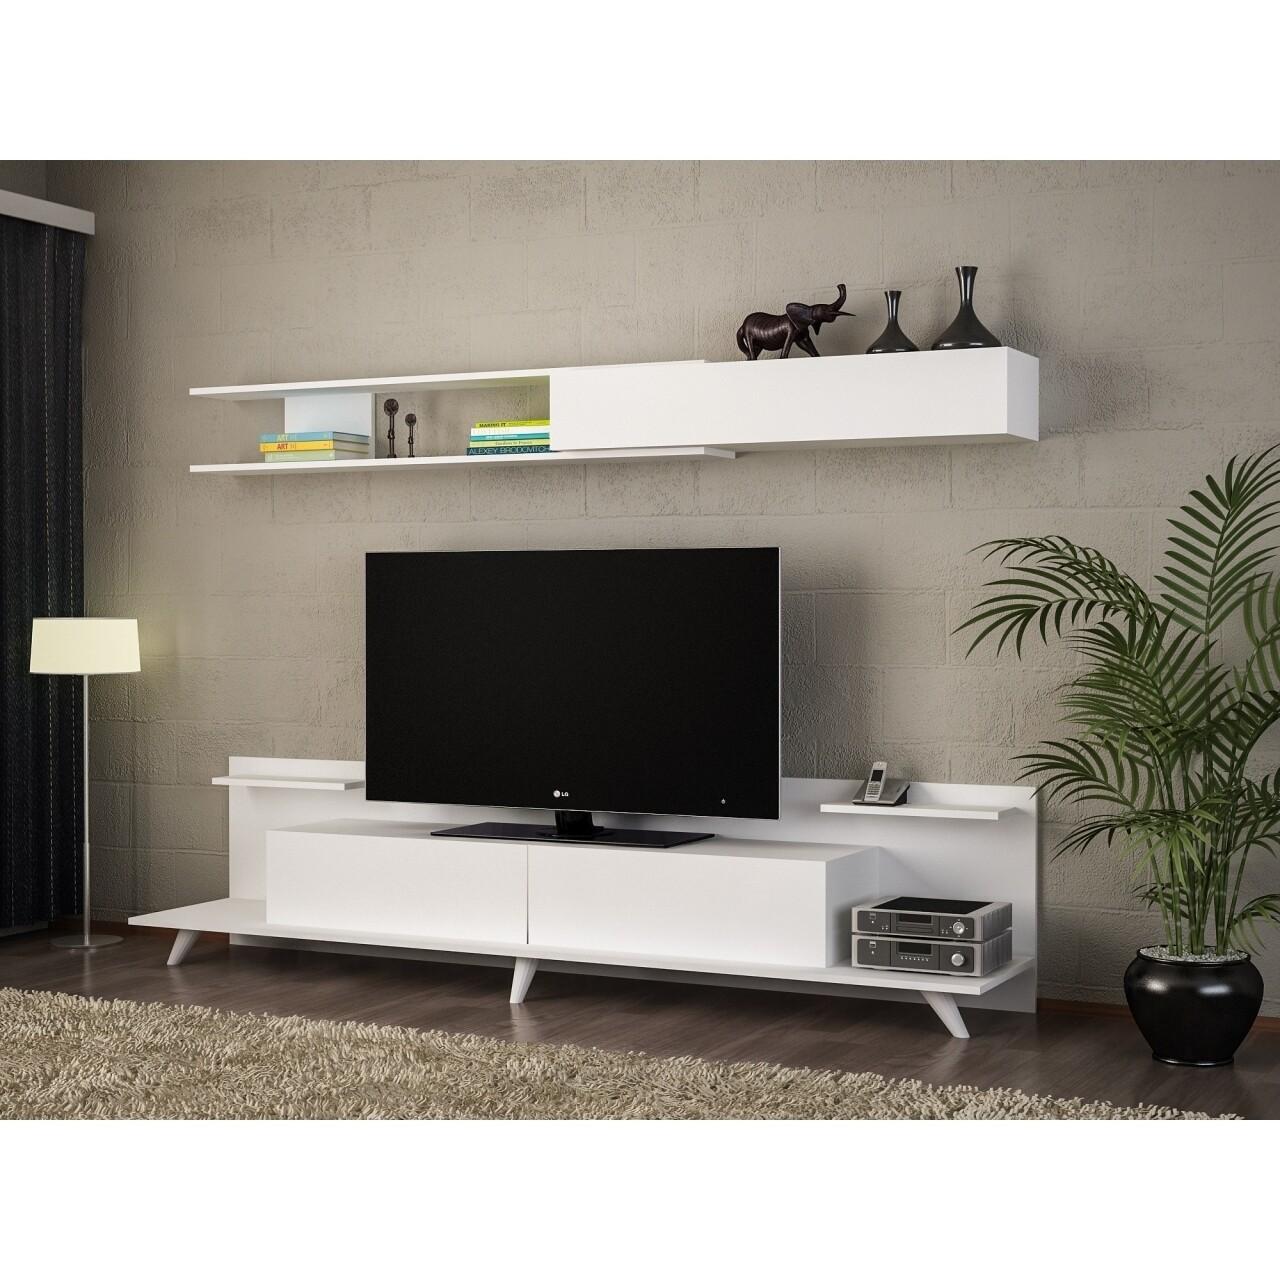 Comoda TV cu raft, Wooden Art, Dore White